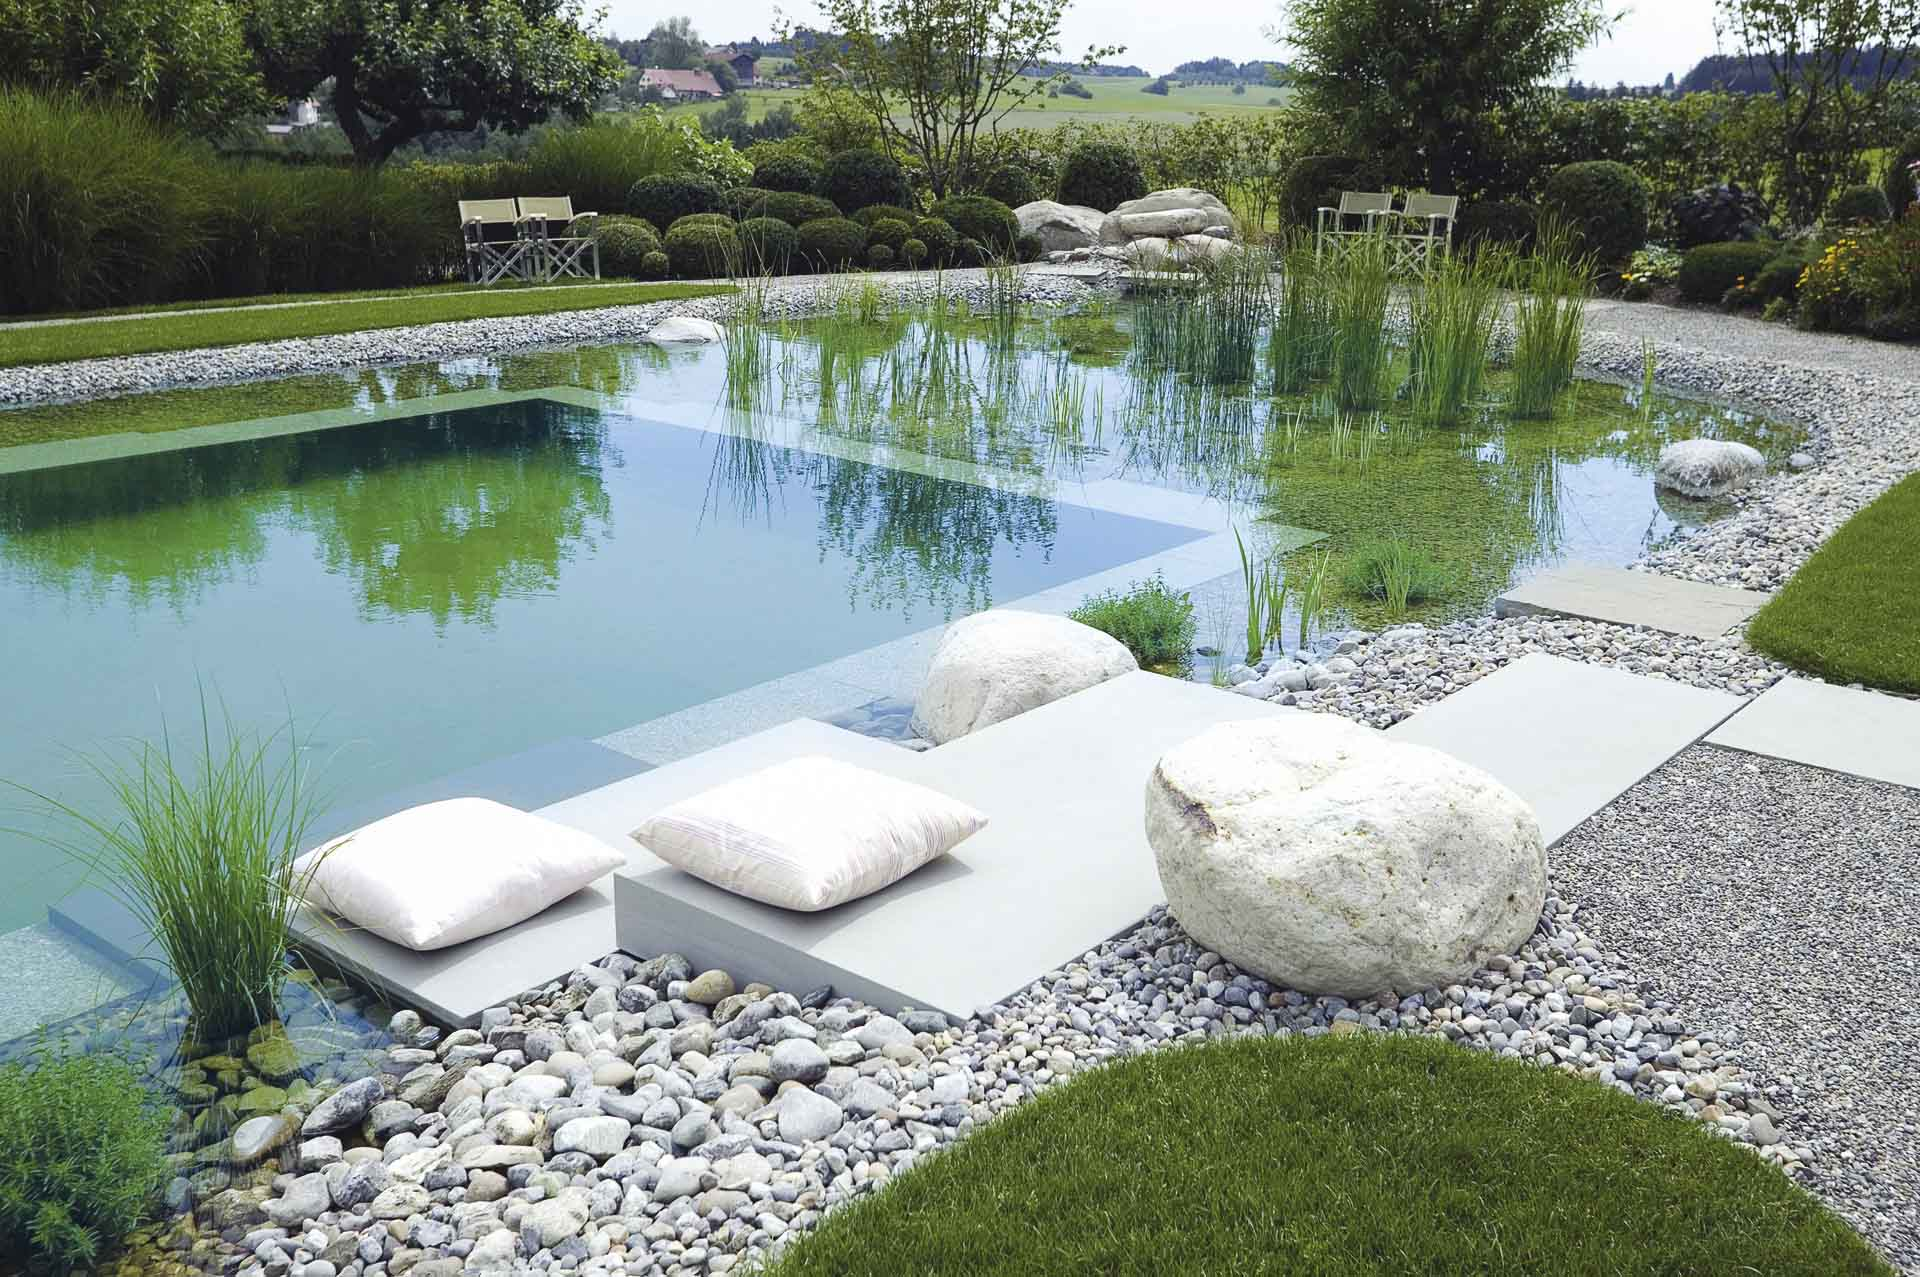 Kilian Gartenbau, Gartensanierung, Landschaftsgärtner 1-